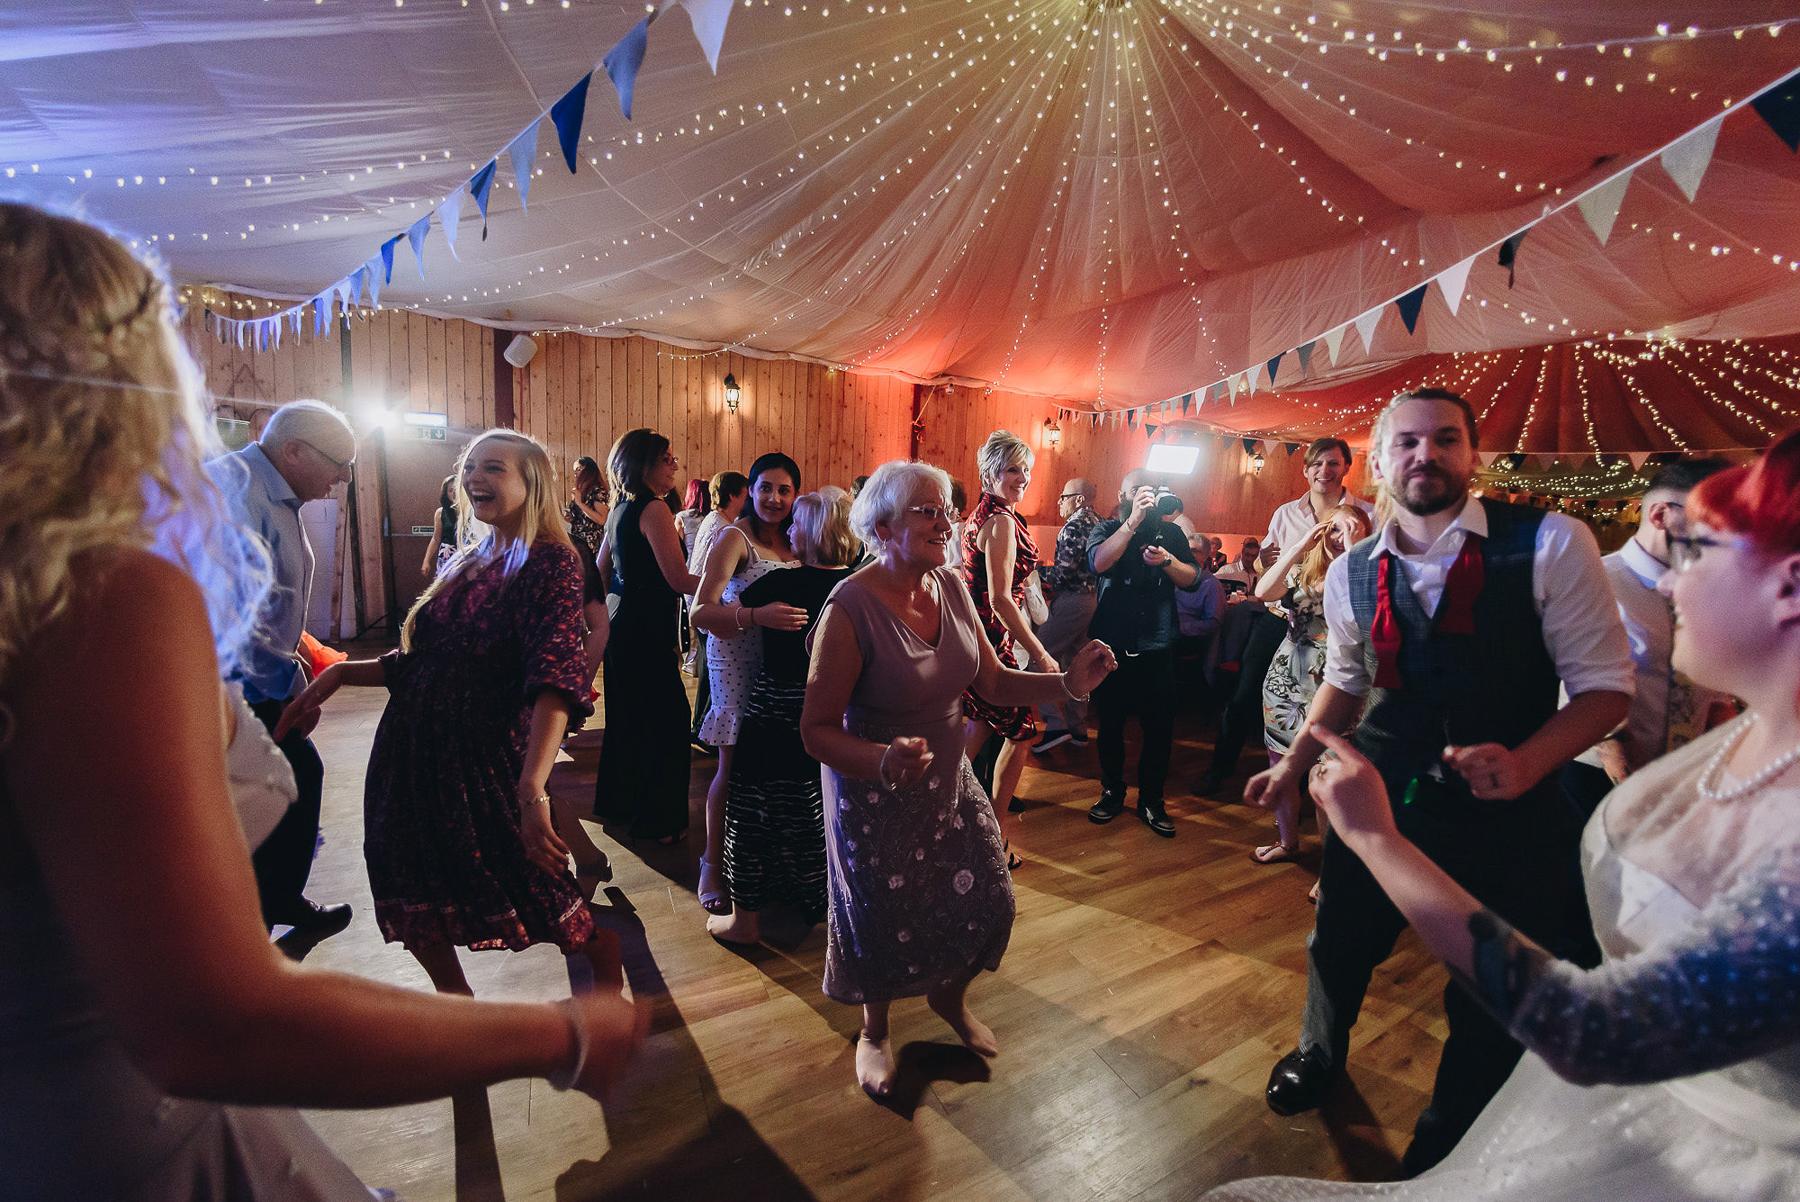 Wellbeing_Farm_Wedding_Photography_The_Pin-Up_Bride_Lara_Shaun-162.jpg